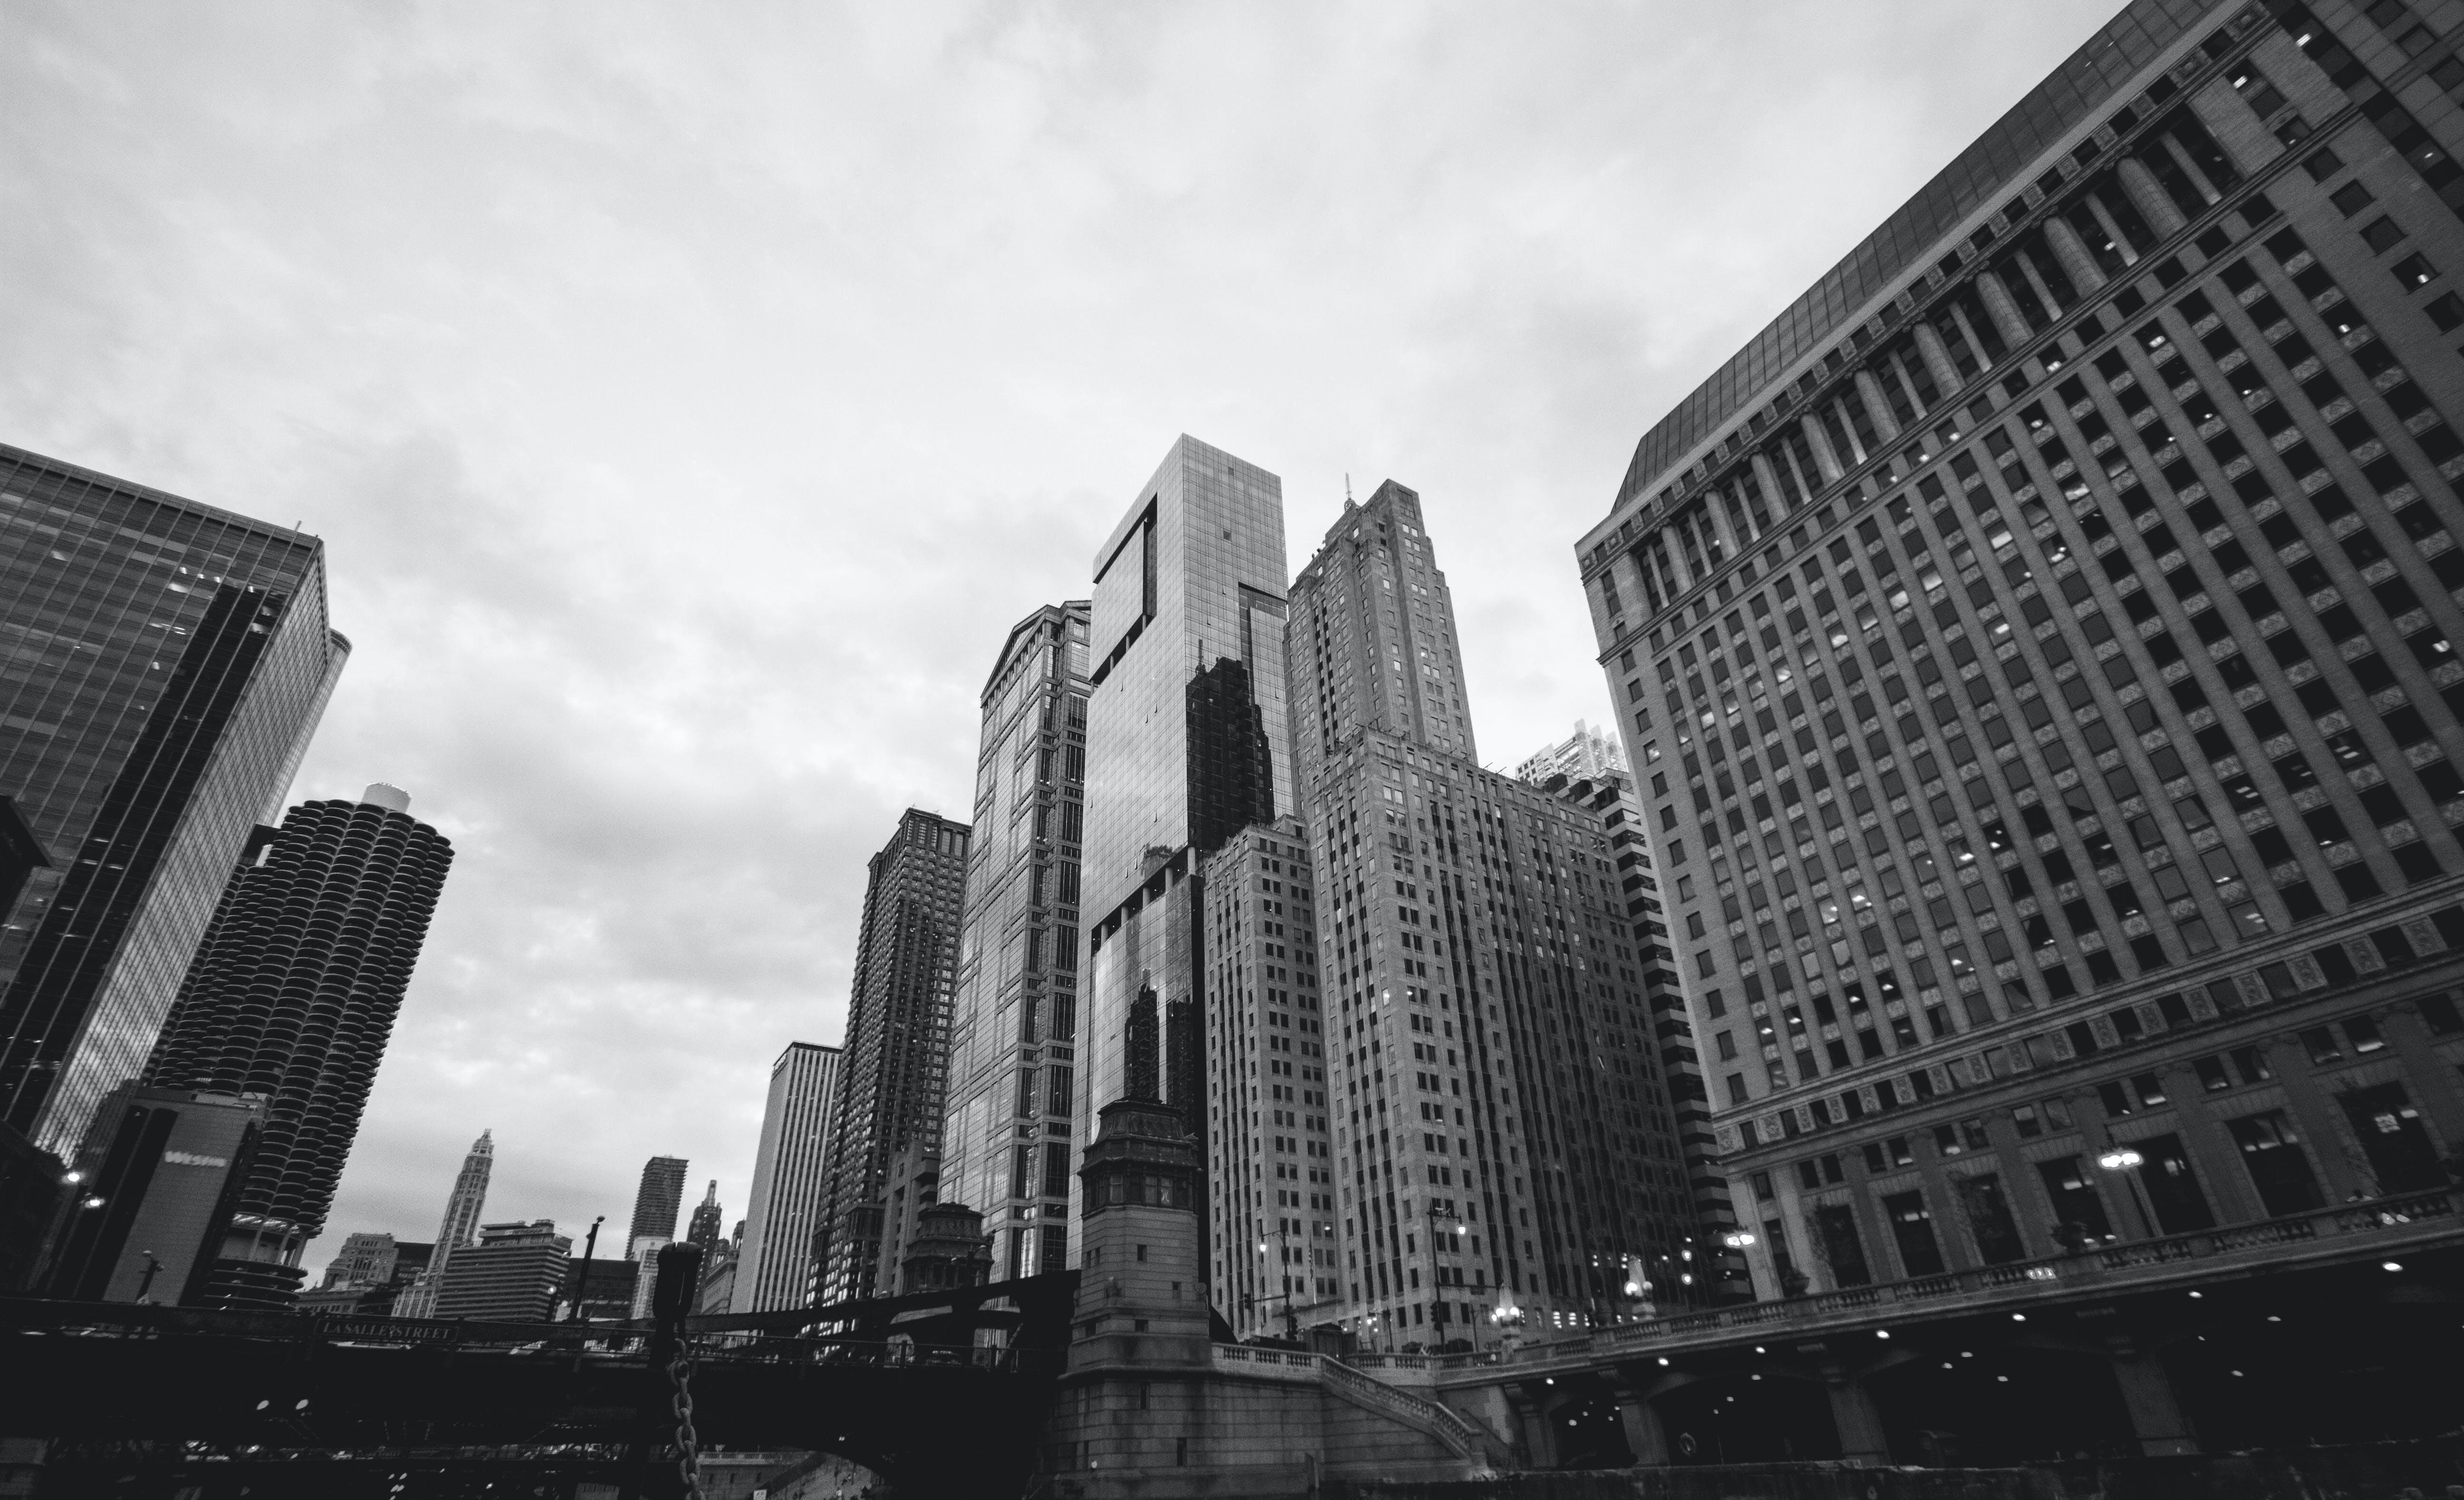 Gratis stockfoto met architectuur, binnenstad, brug, financiën